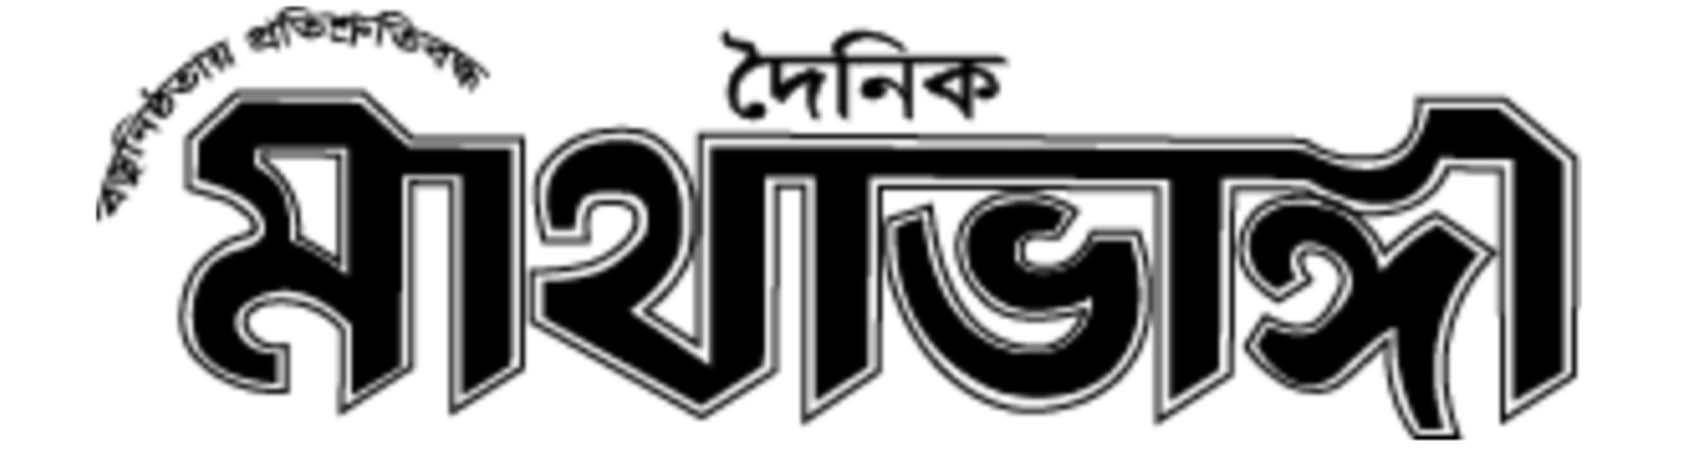 Daily Mathabhanga